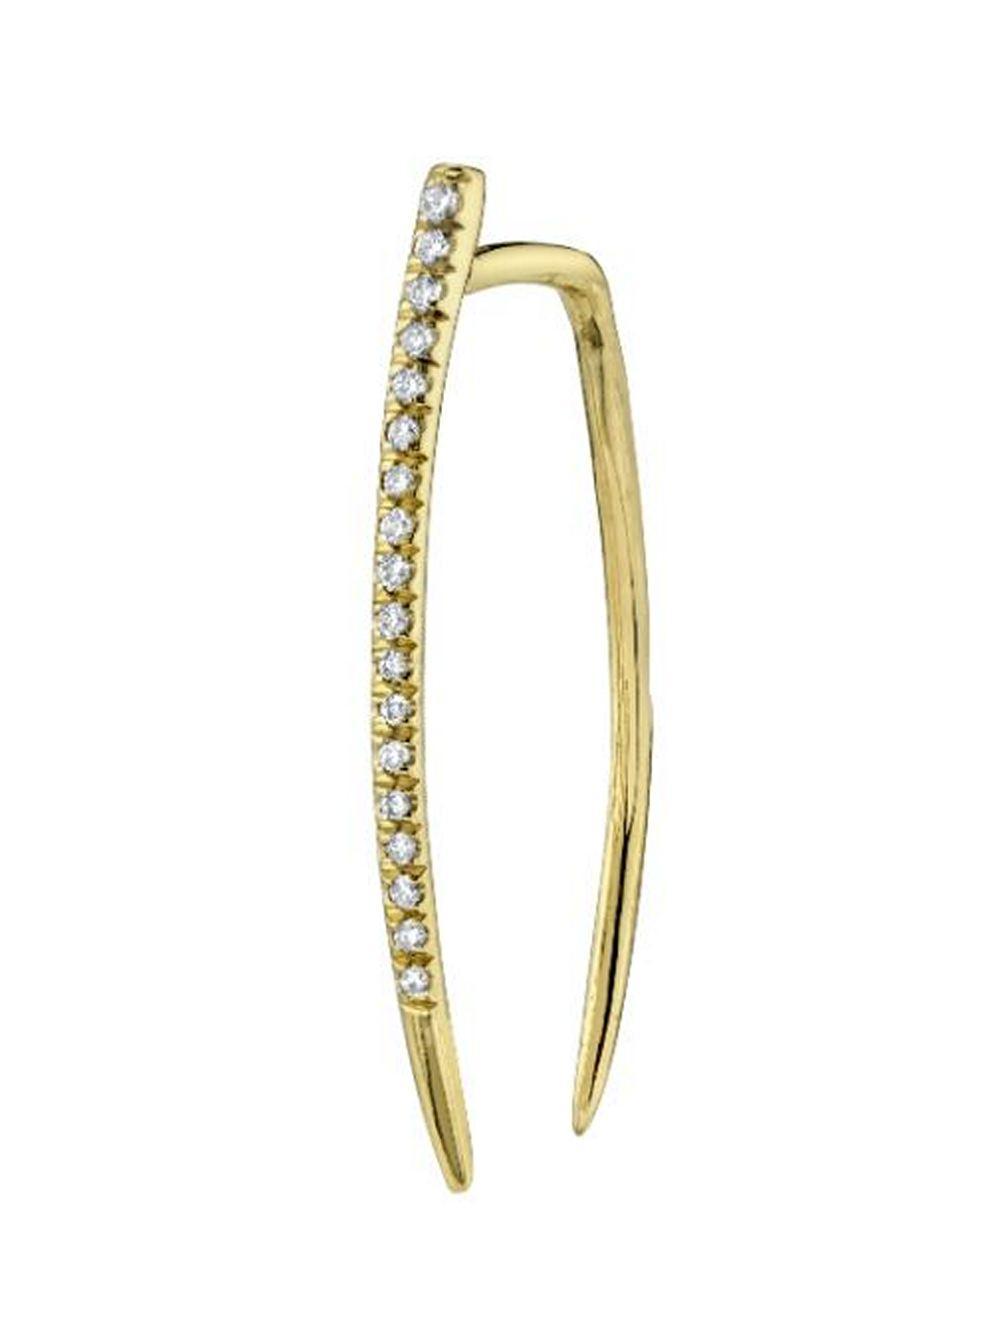 Large Tusk Single Earring With Pavé Diamonds